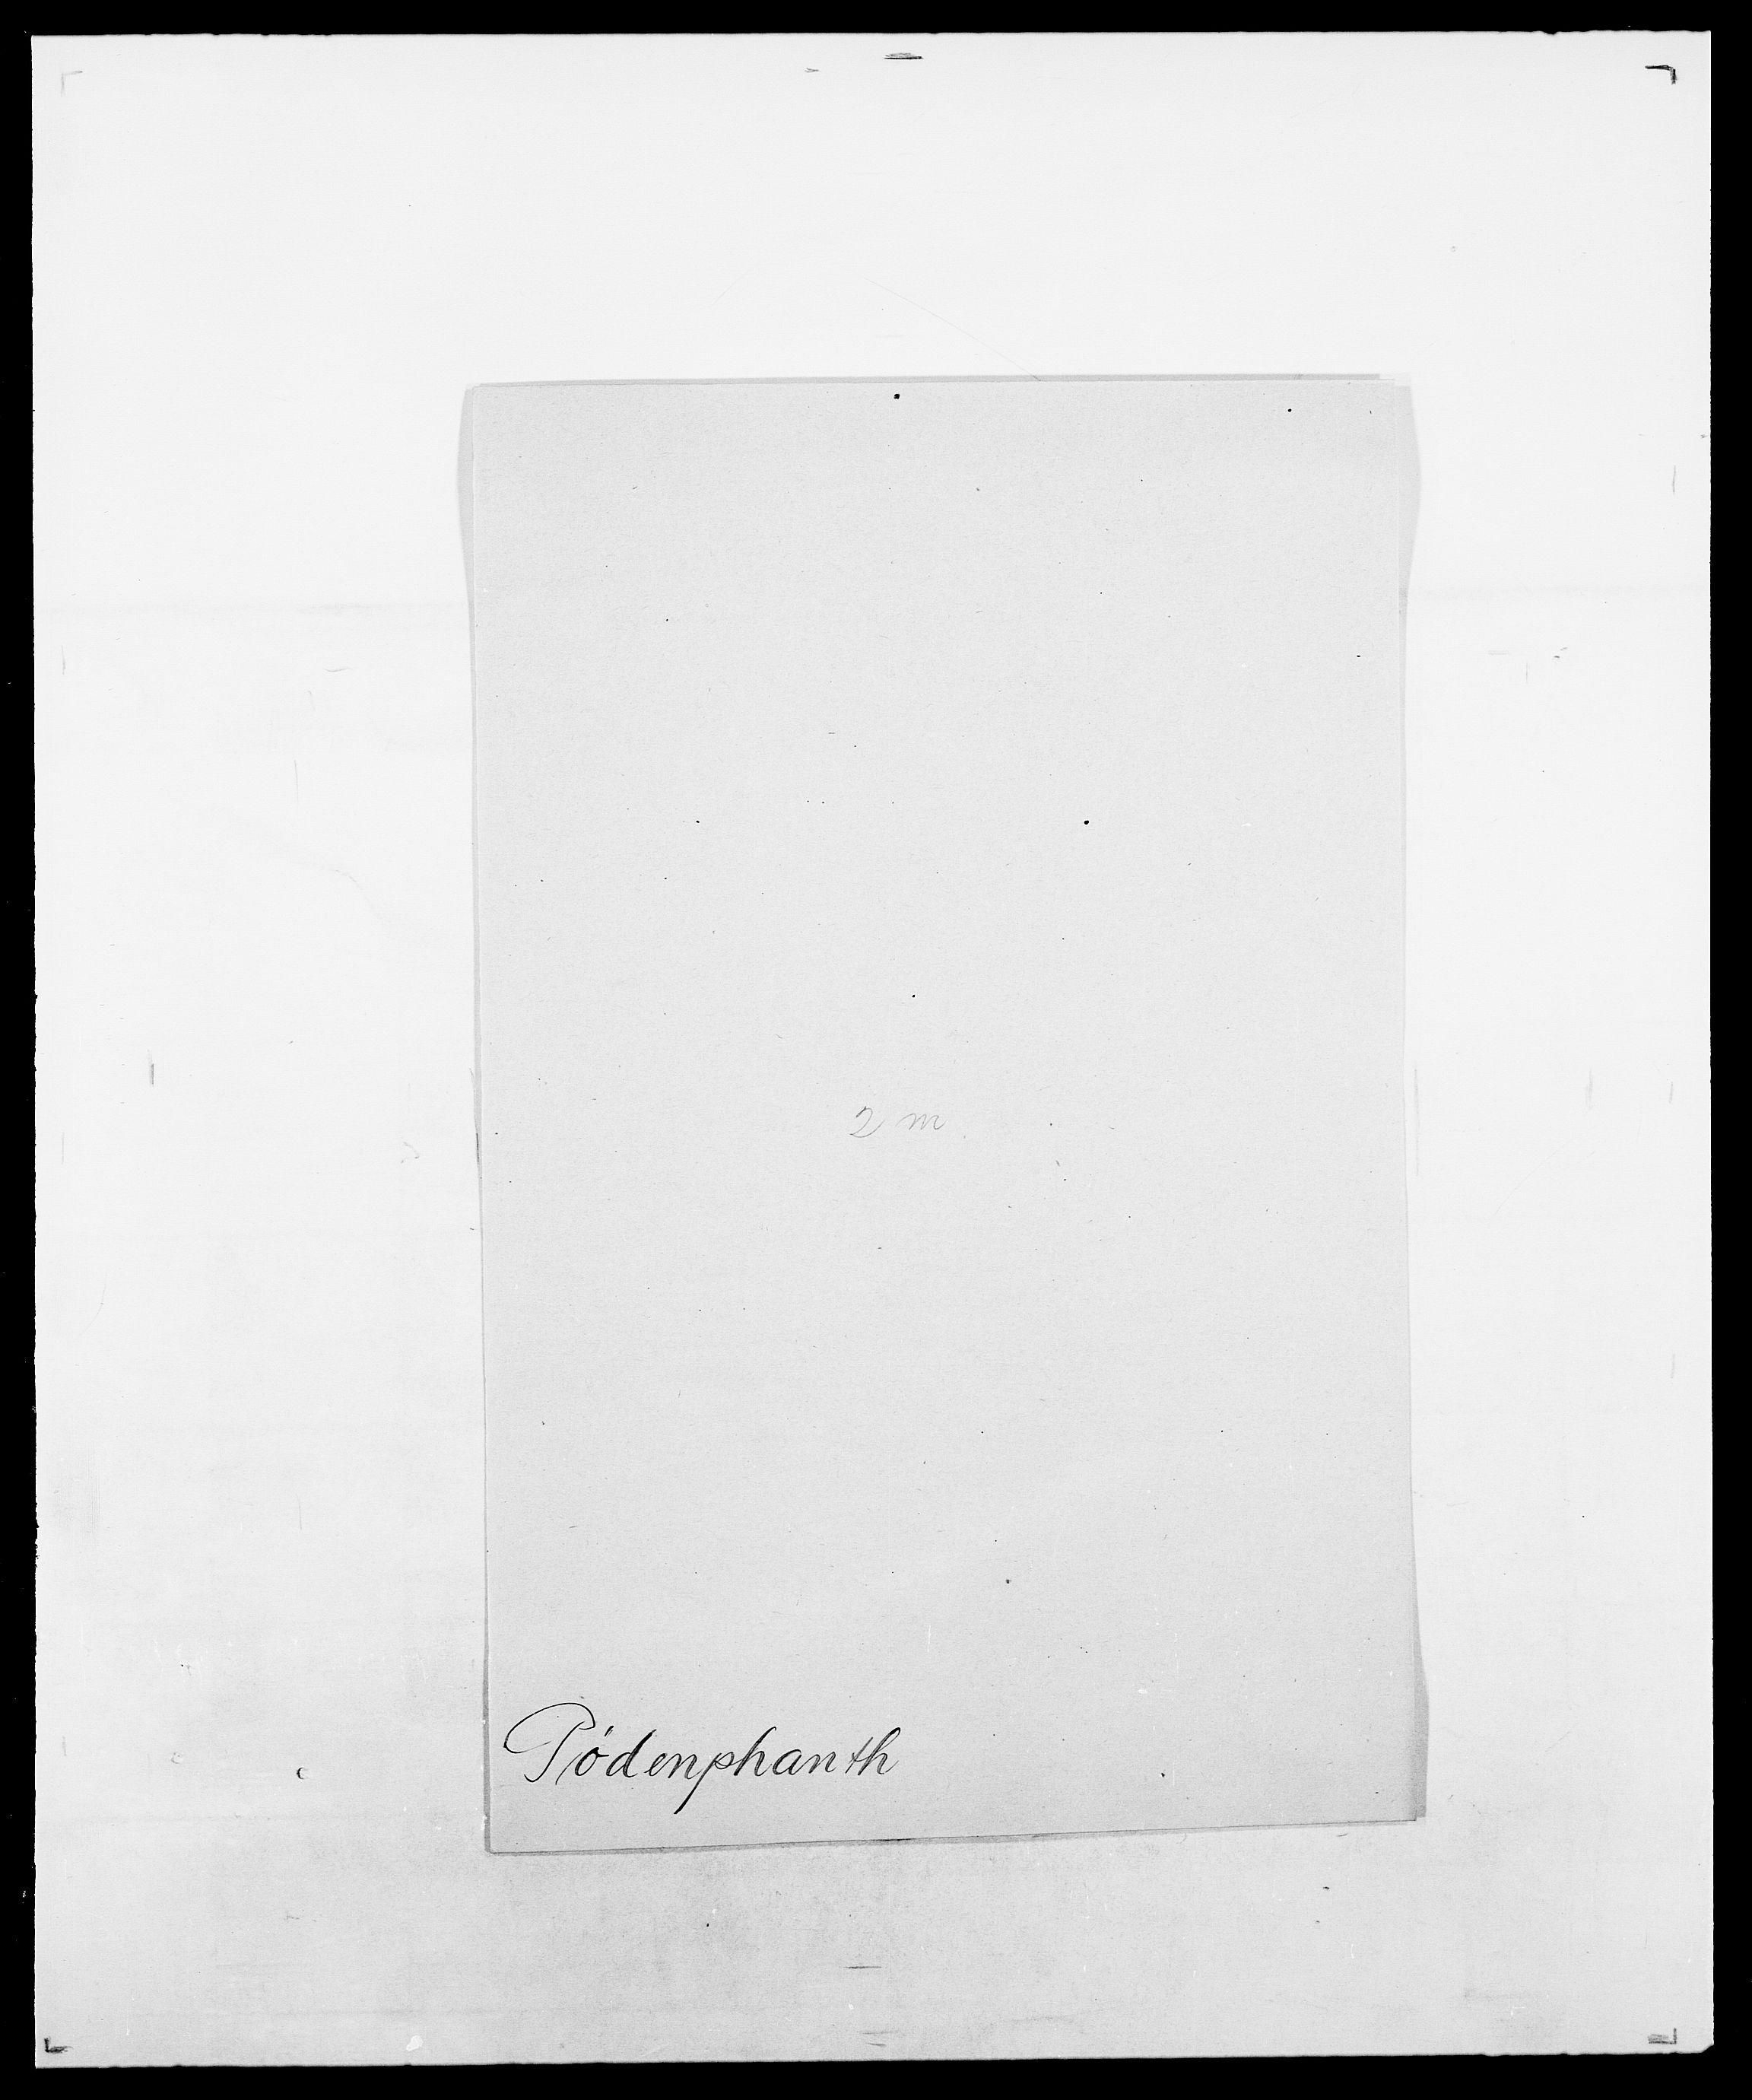 SAO, Delgobe, Charles Antoine - samling, D/Da/L0031: de Place - Raaum, s. 454